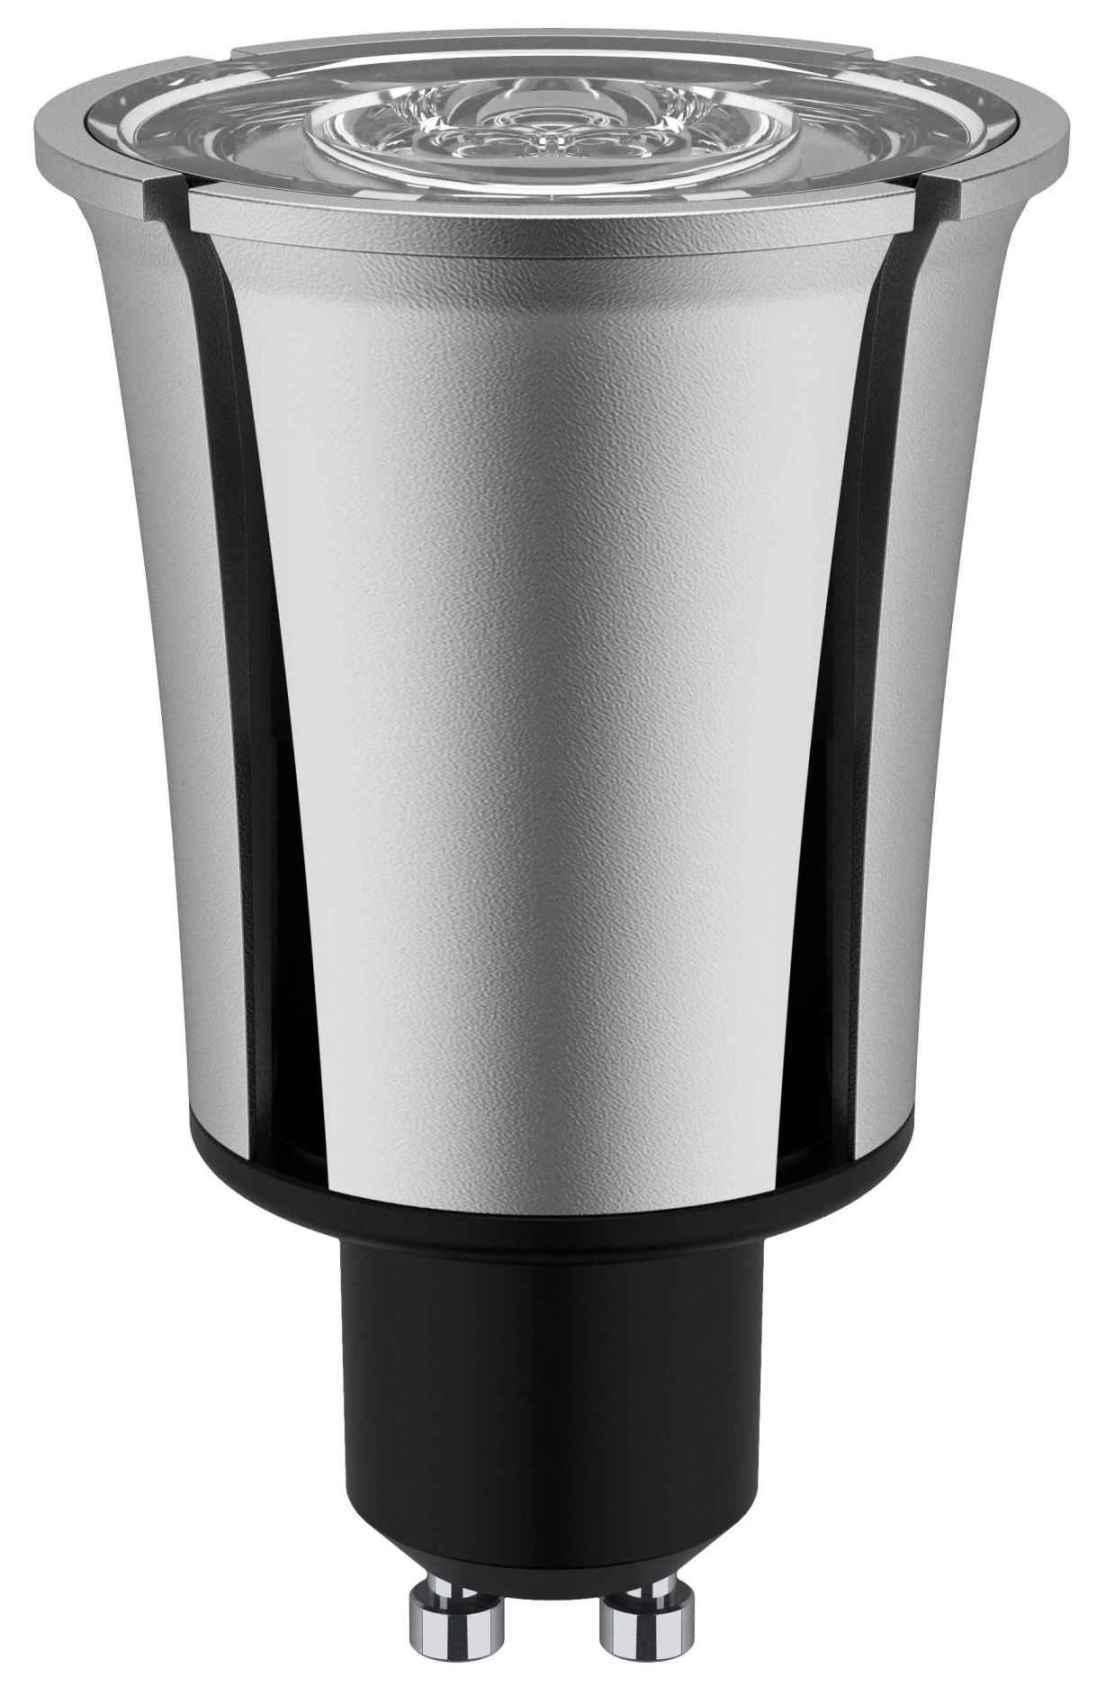 led lampe par16 gu10 8 watt dimmbar kaltwei k che haushalt. Black Bedroom Furniture Sets. Home Design Ideas